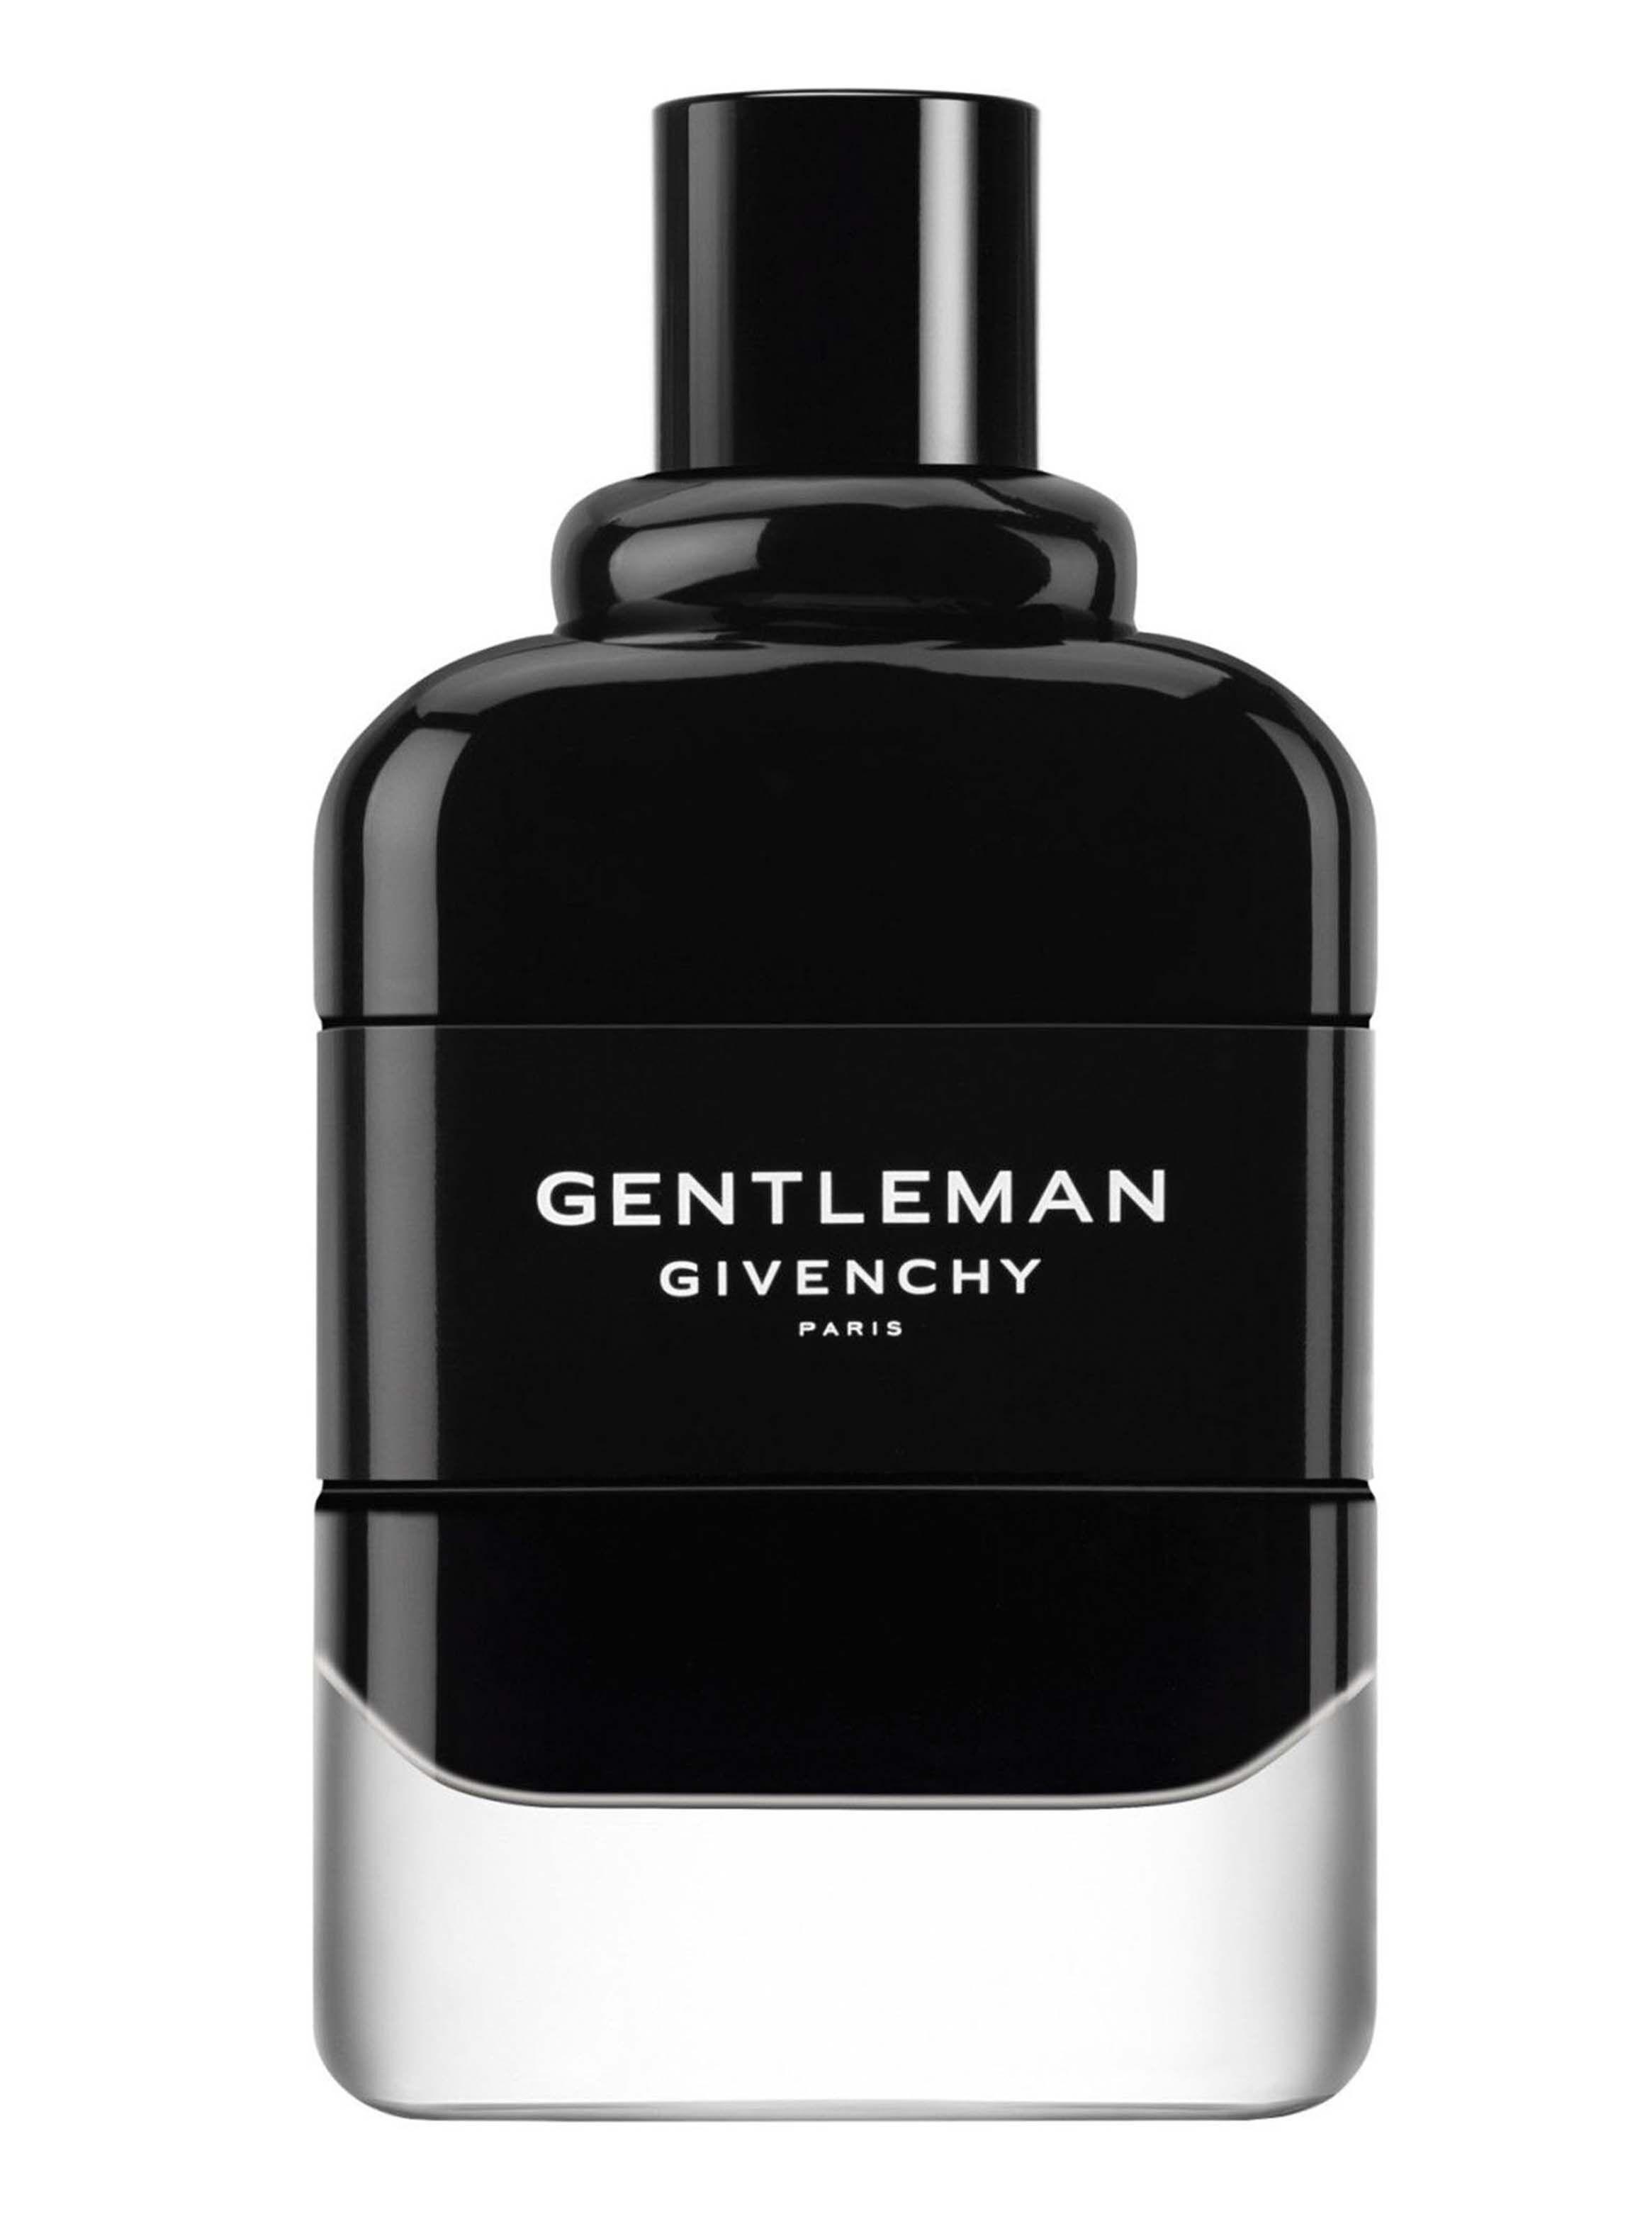 En Givenchy 100 HombreParis Perfumes Gentleman Perfume Edp Ml CsrdthQxB